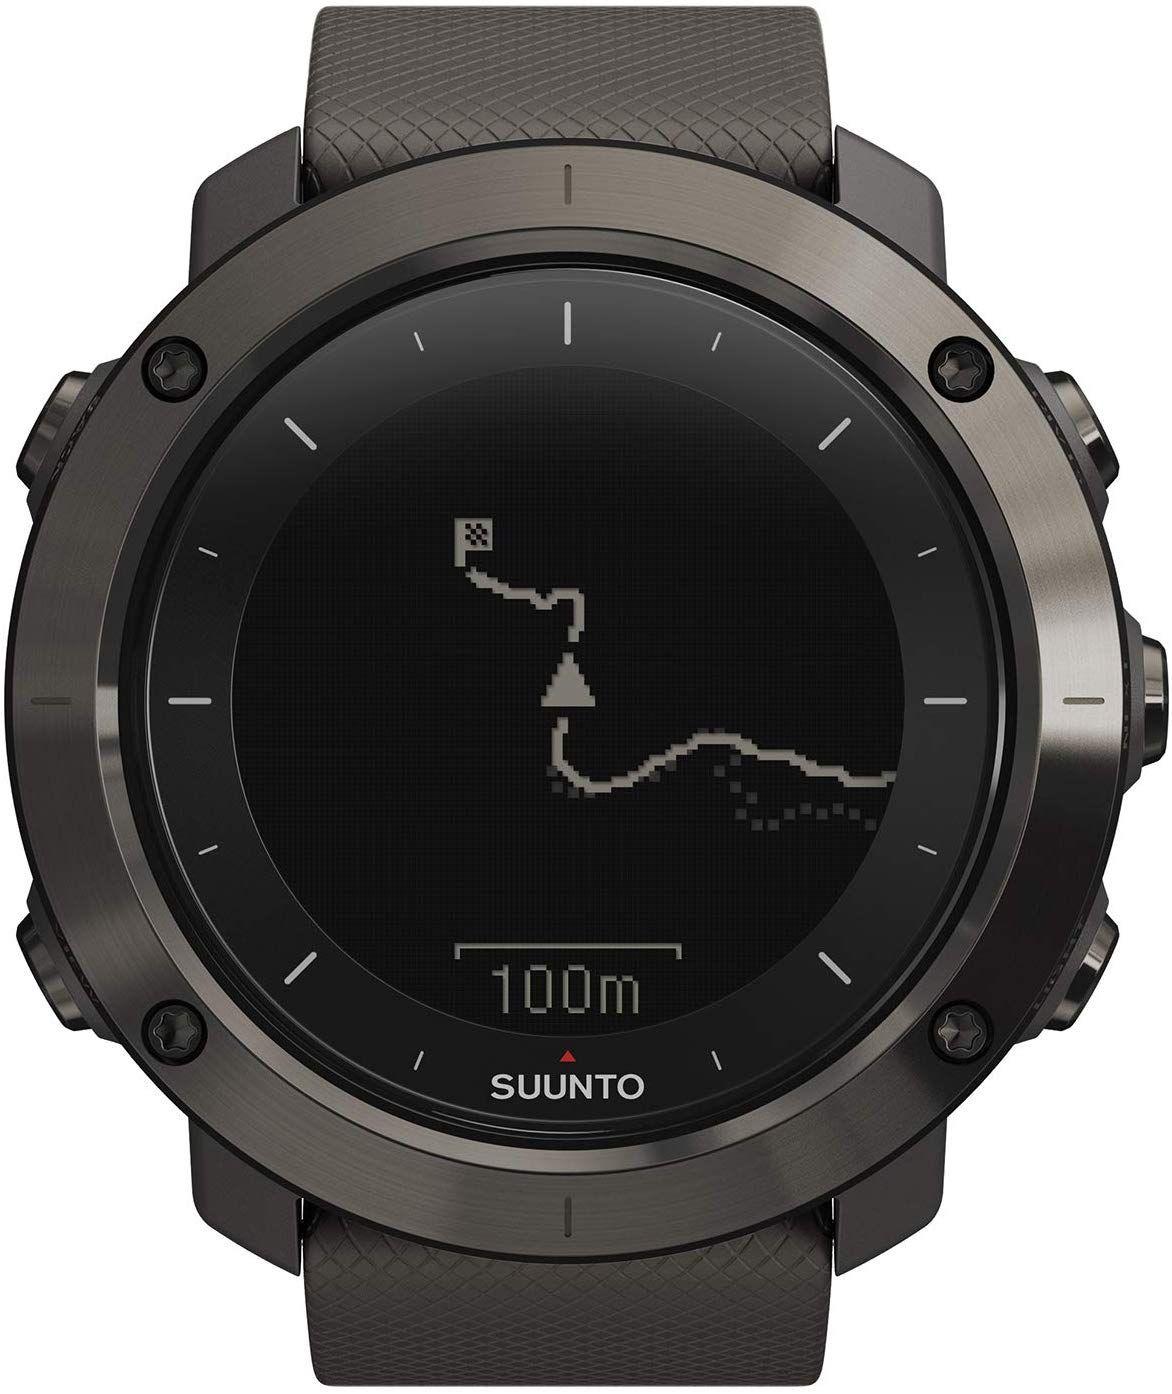 Reloj GPS para travesía. (Reaco) *MB*